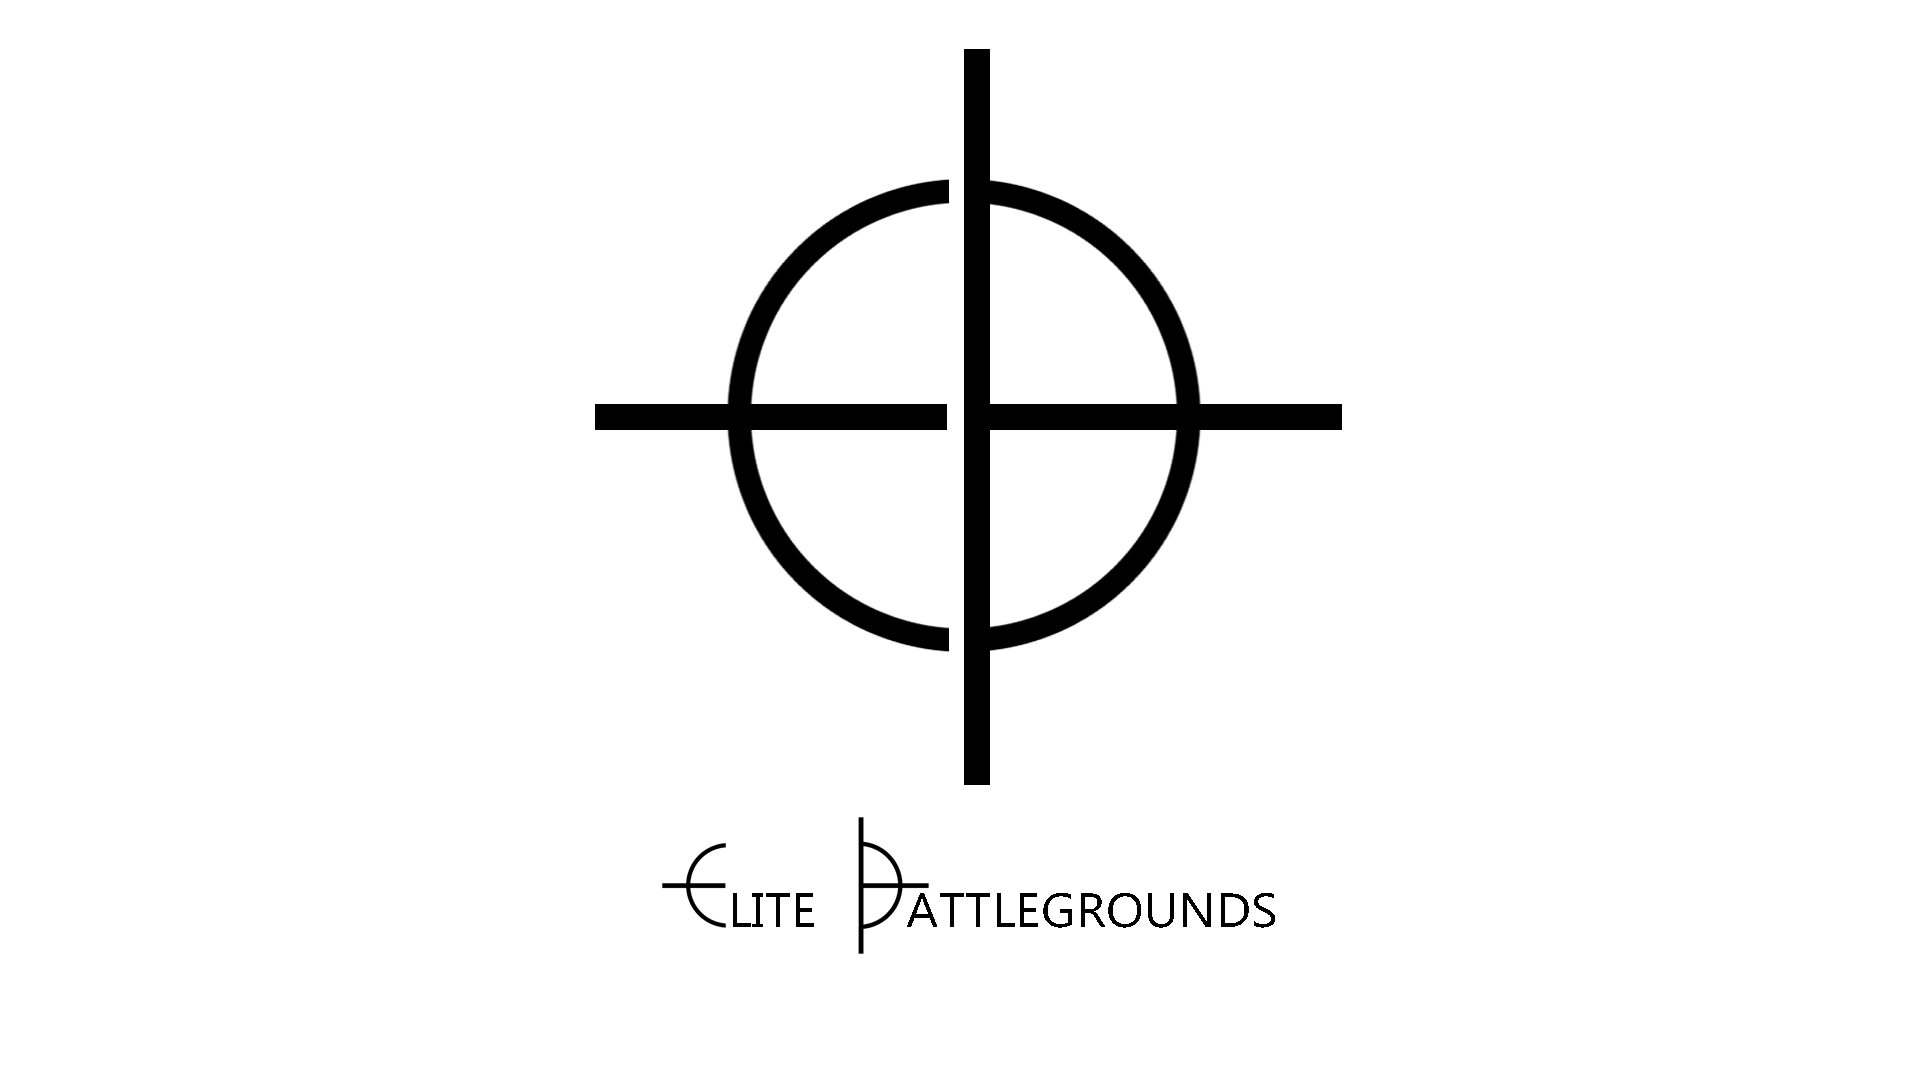 Logo Design by Sam Hedrén - Entry No. 63 in the Logo Design Contest Creative Logo Design for Elite Battlegrounds.